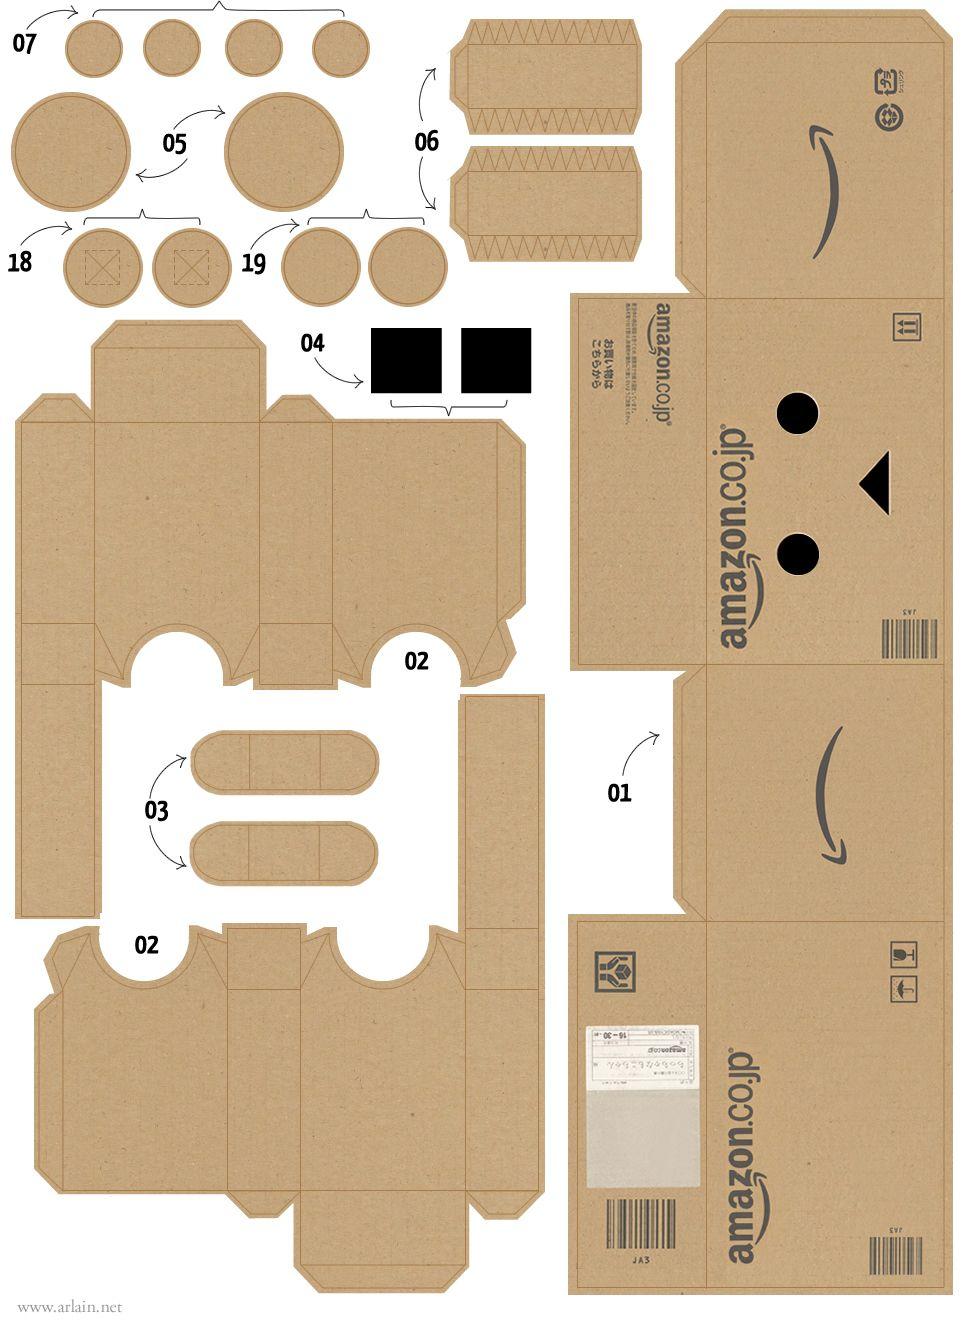 Danboard Papercraft Amazon 01 by Zarzamorita.deviantart ...